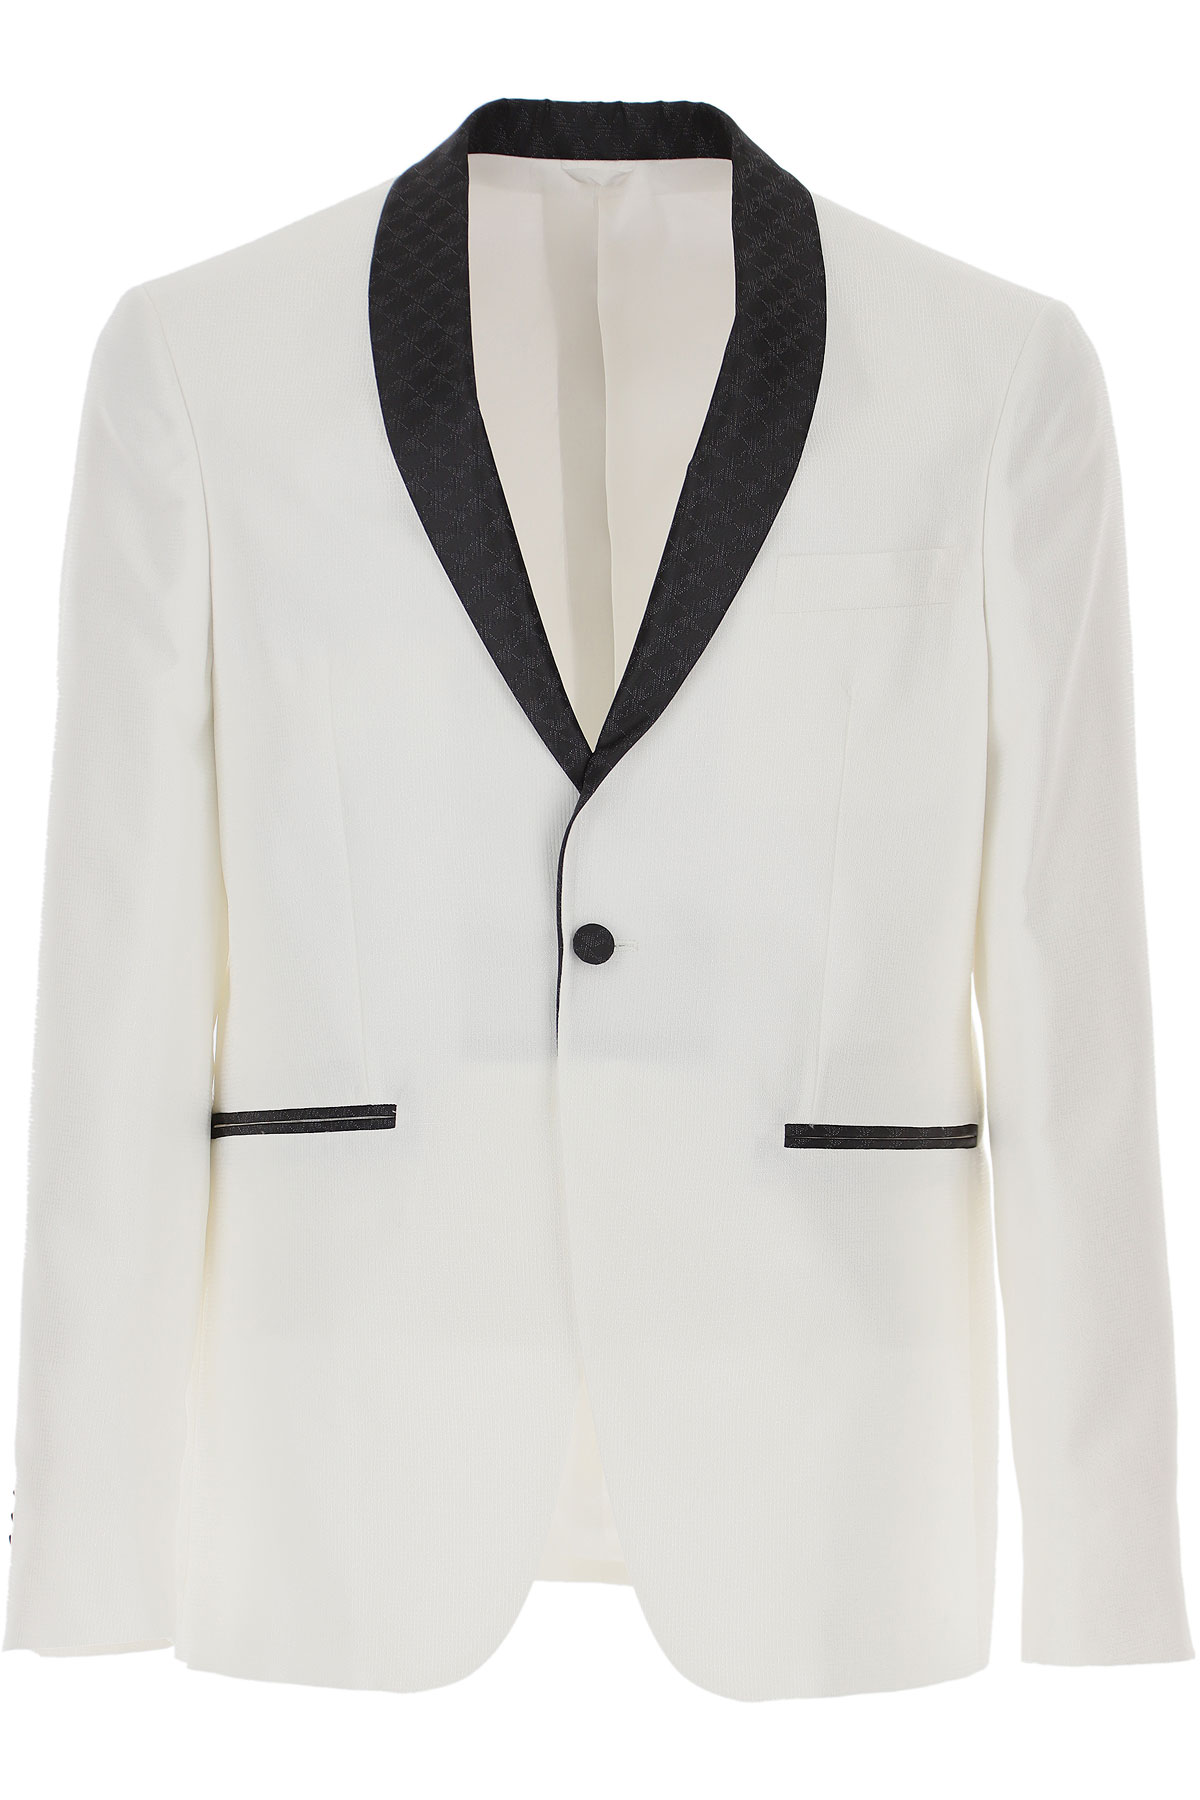 Simbols Blazer for Men, Sport Coat On Sale, White, polyester, 2019, L M S XL XXL